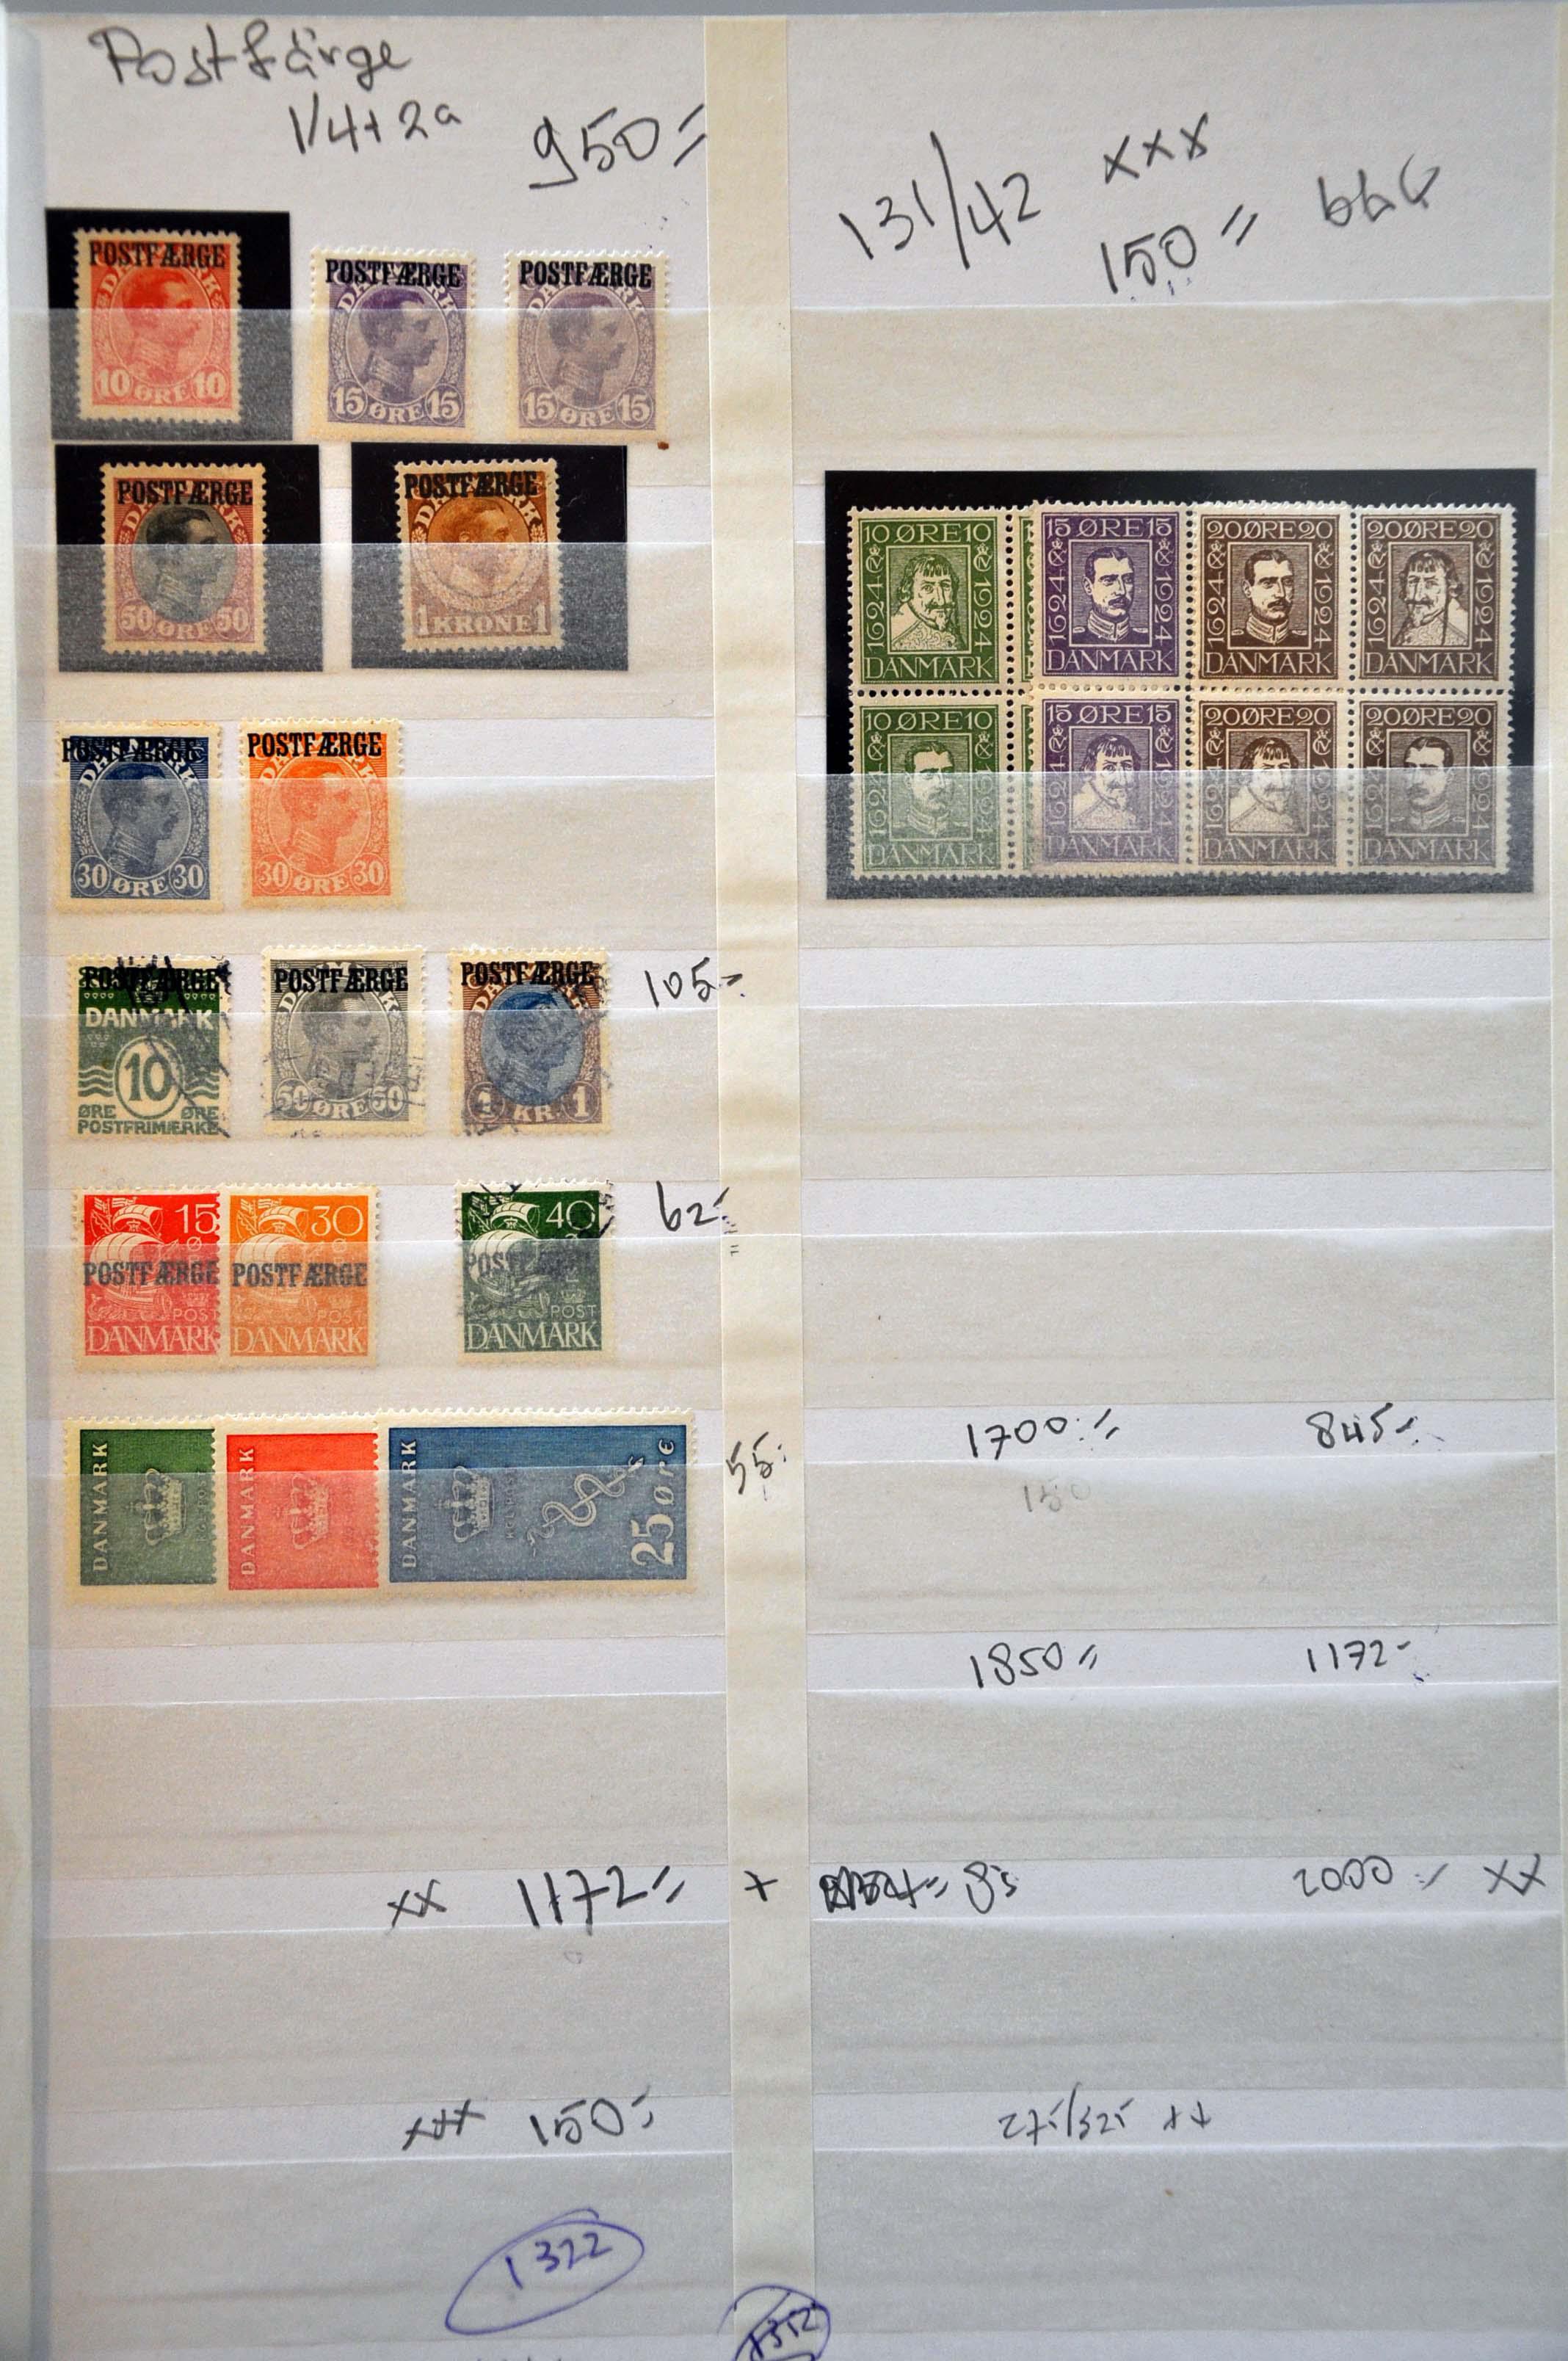 Lot 2694 - scandinavia Denmark - Corinphila Veilingen Auction 237 Part 2:  General sale